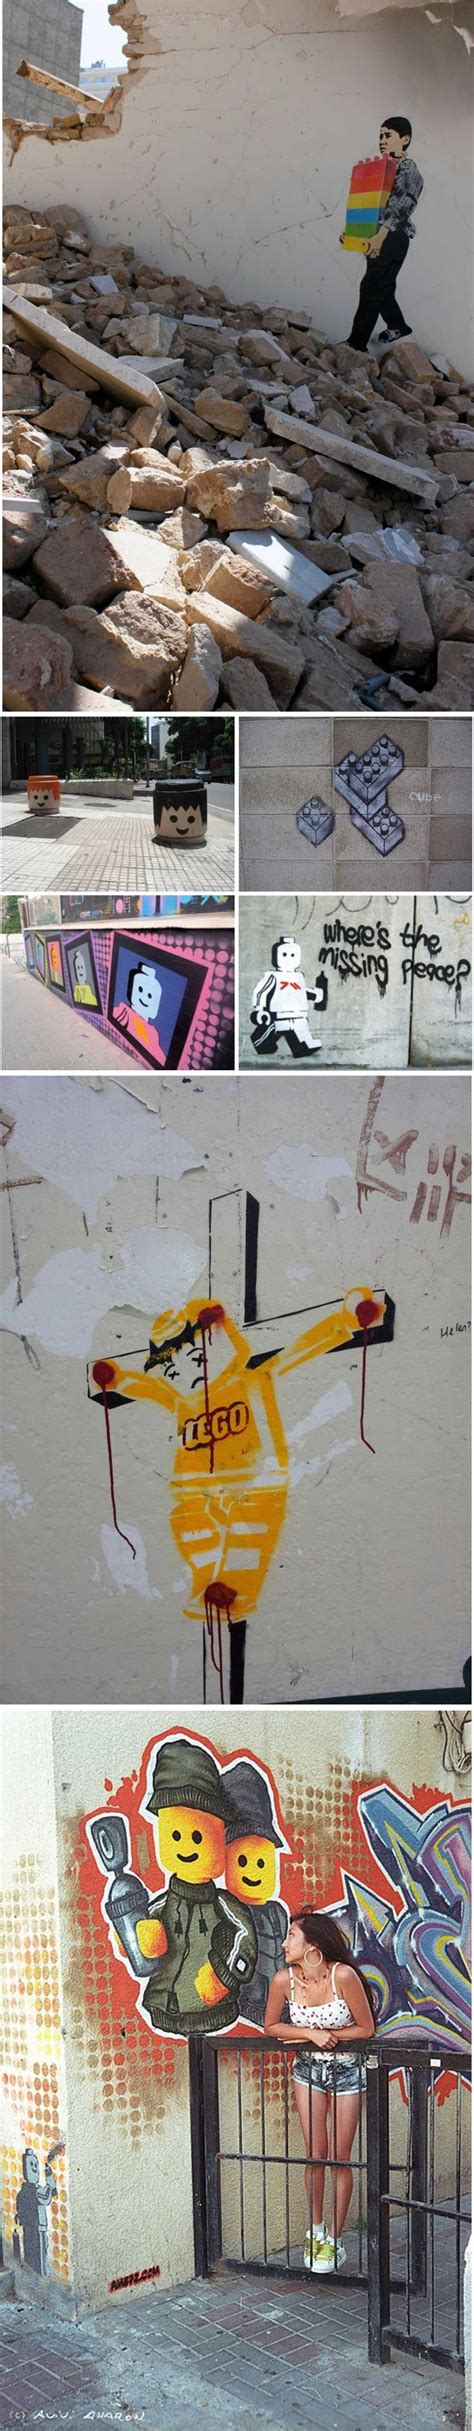 Graffiti Or Vandalism Essay by Graffiti Vandalism Essay